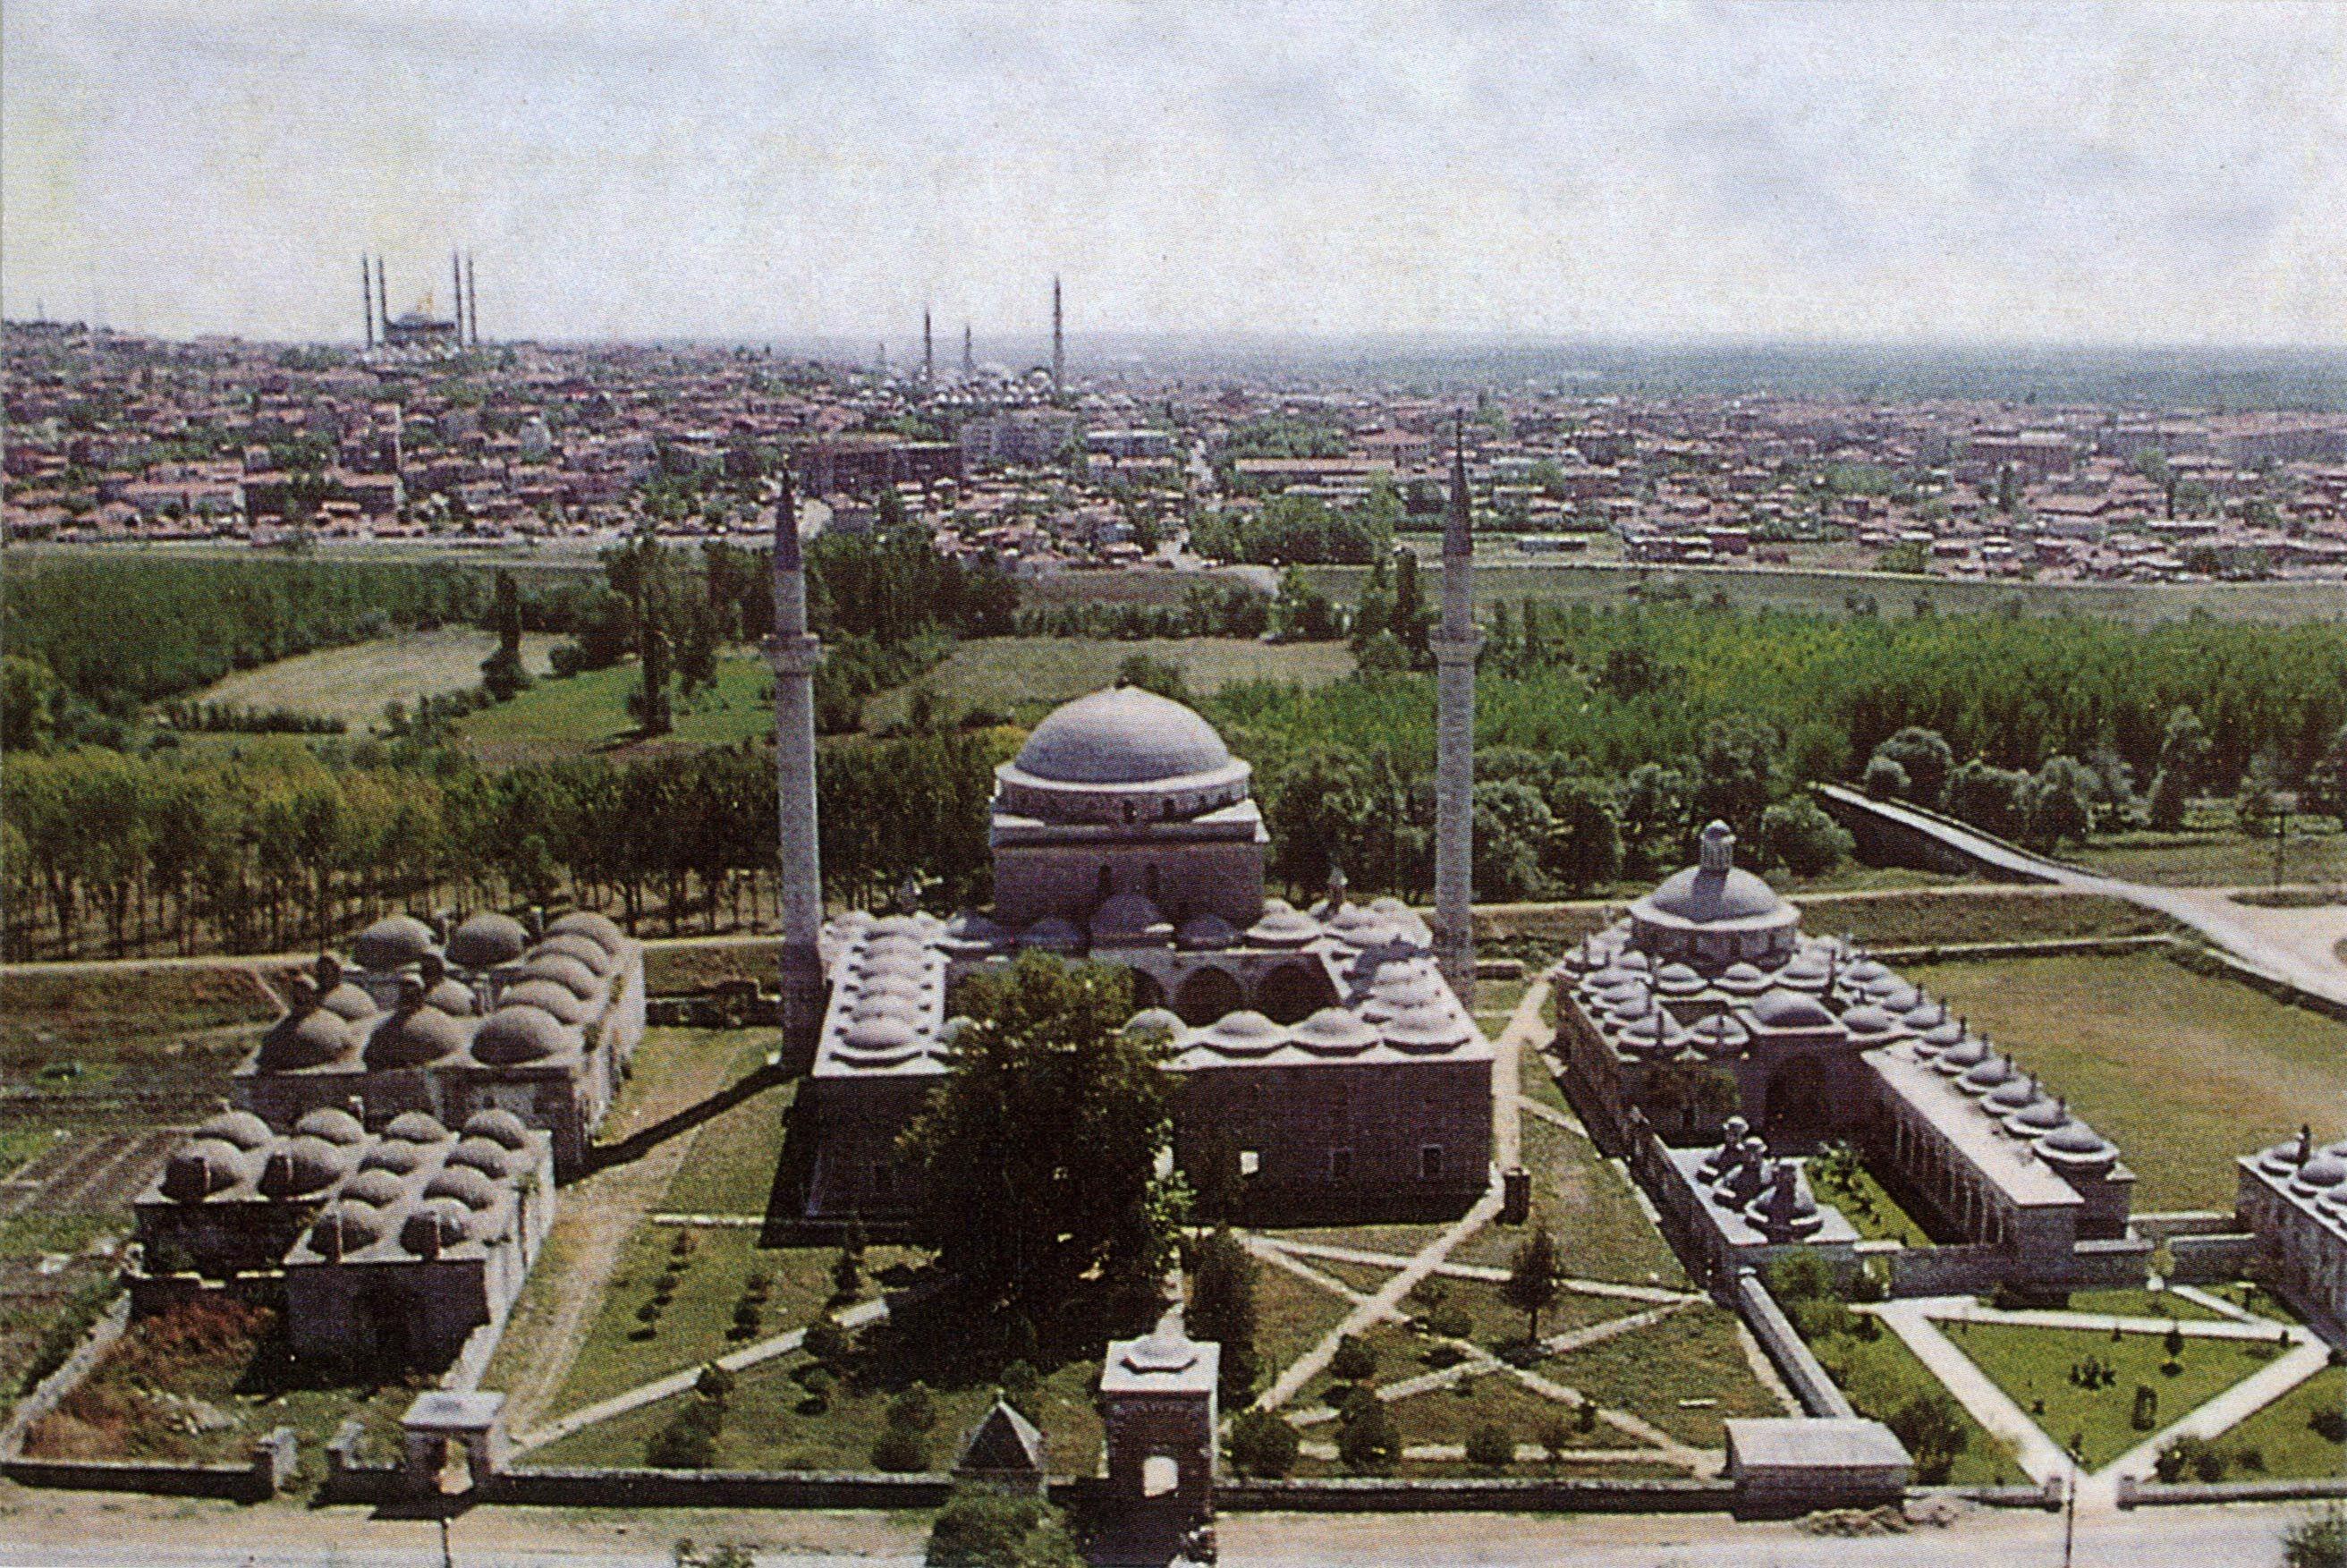 II. Beyazid Complex and Hospital